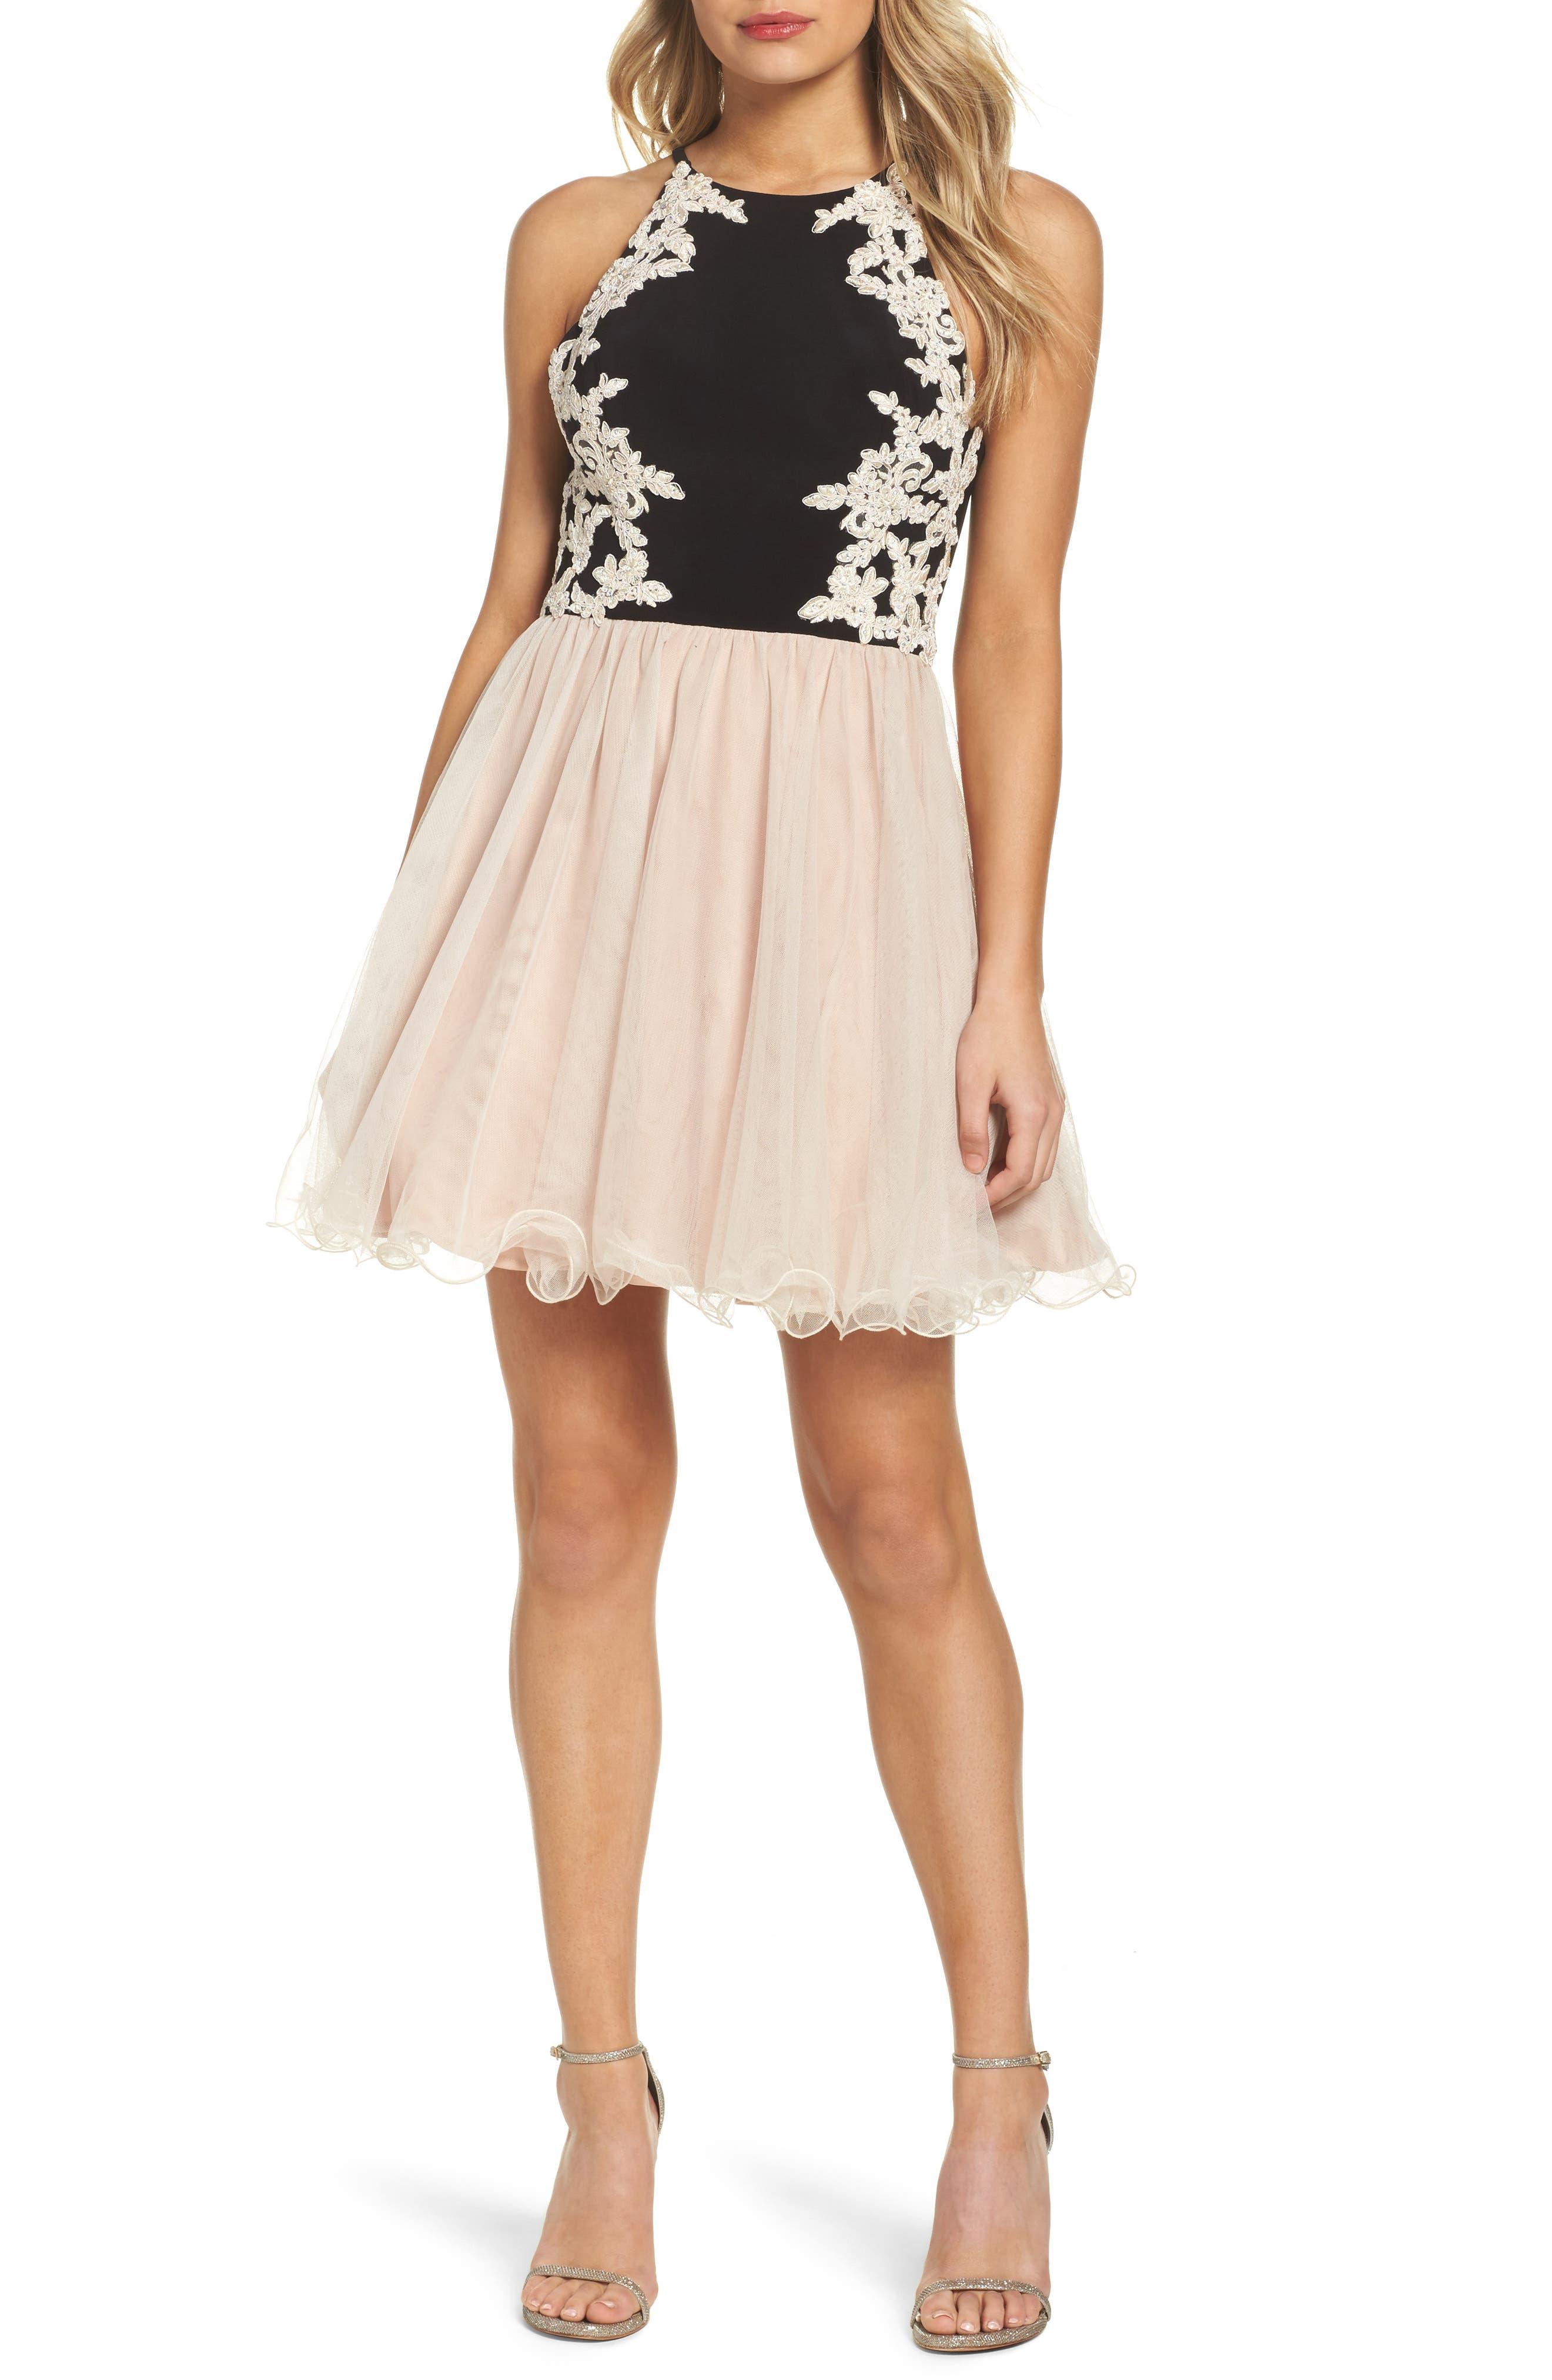 Alternate Image 1 Selected - Blondie Nites Appliqué Fit & Flare Dress